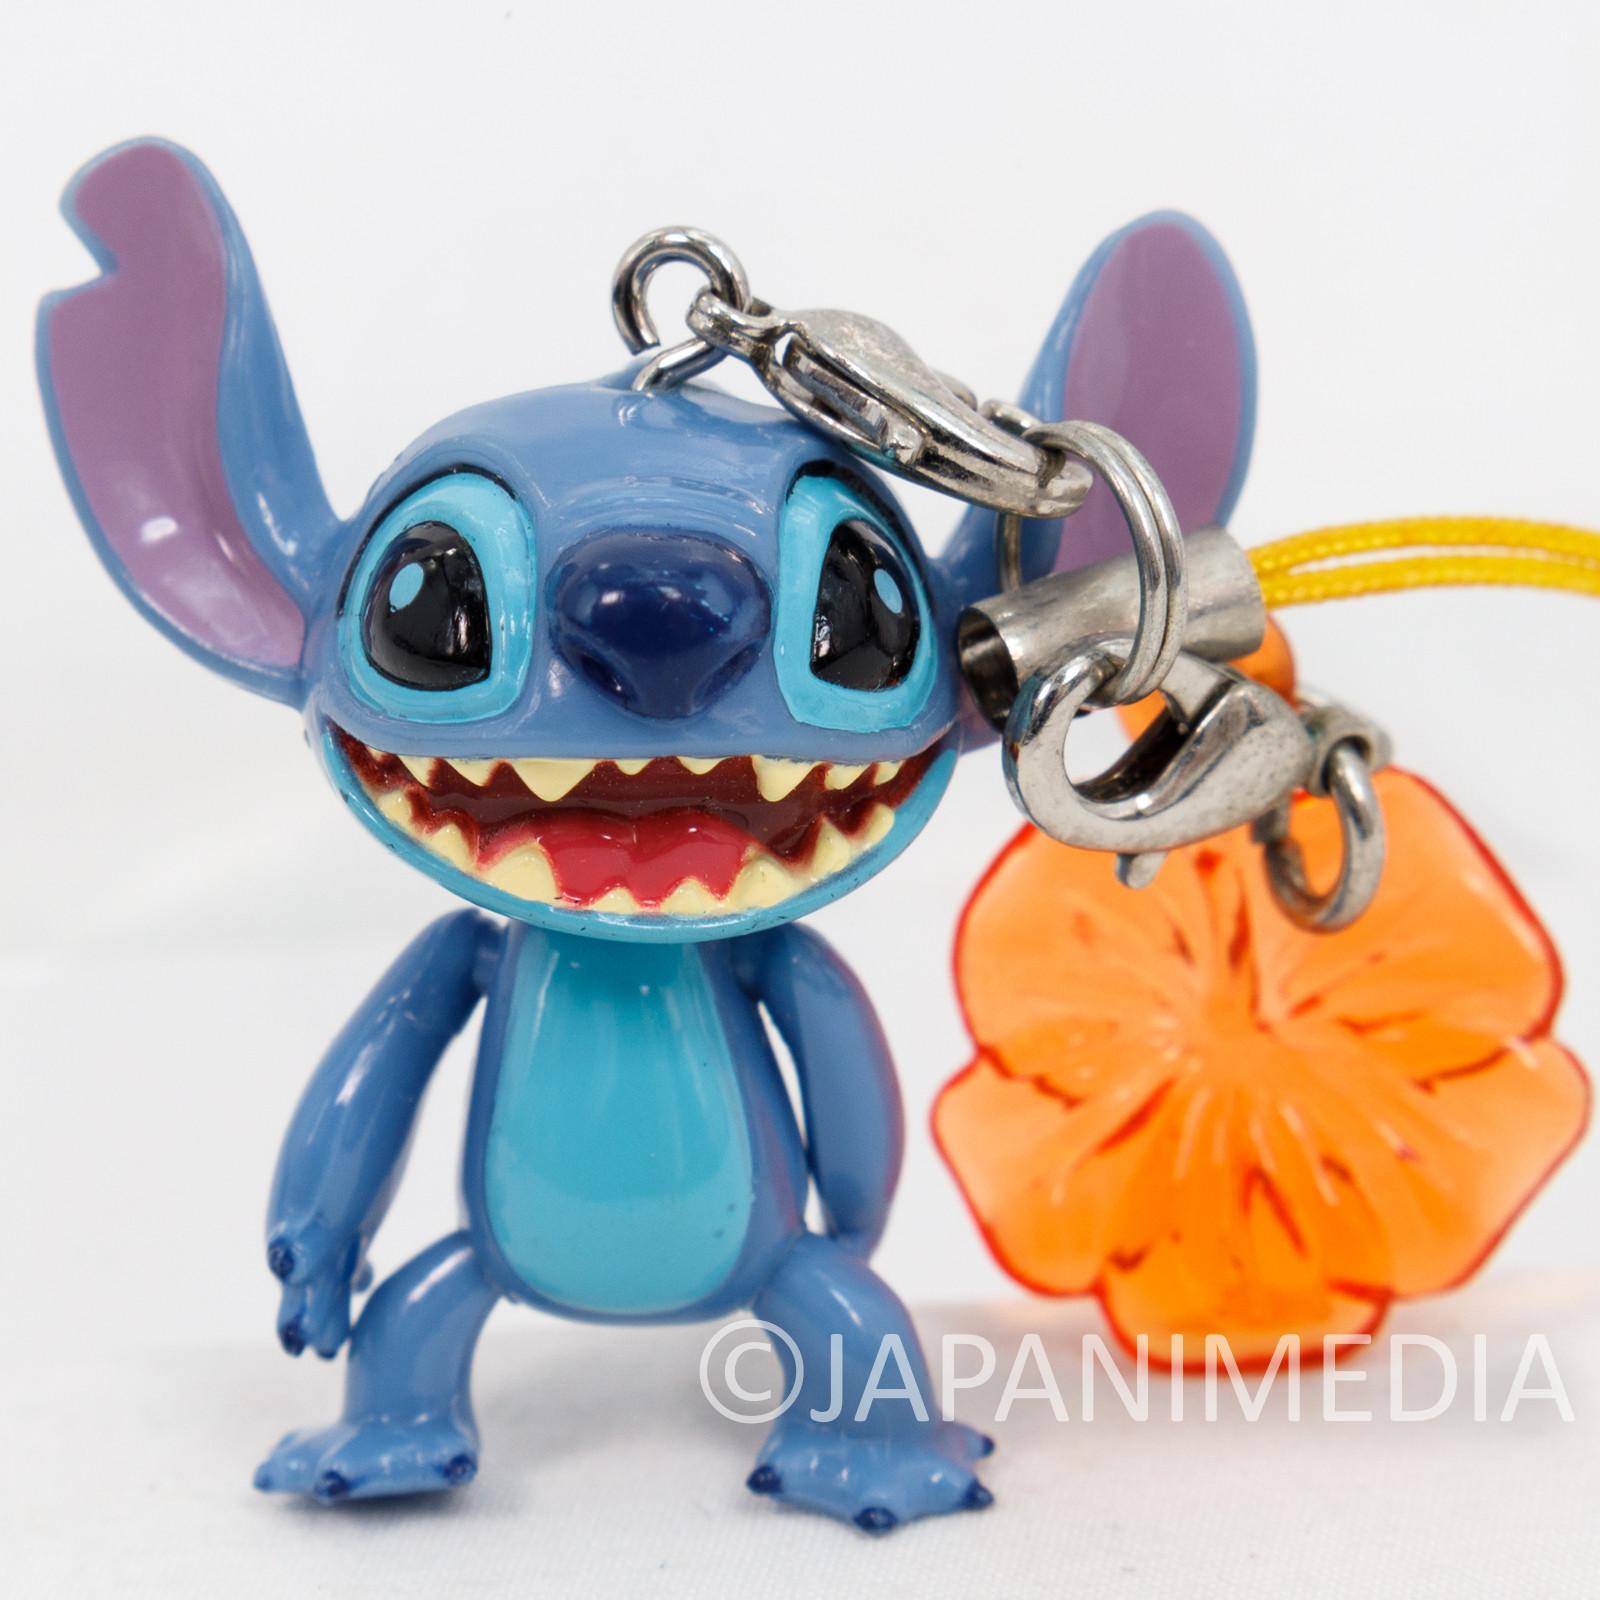 Disney Stitch Mascot Action Figure Strap JAPAN ANIME